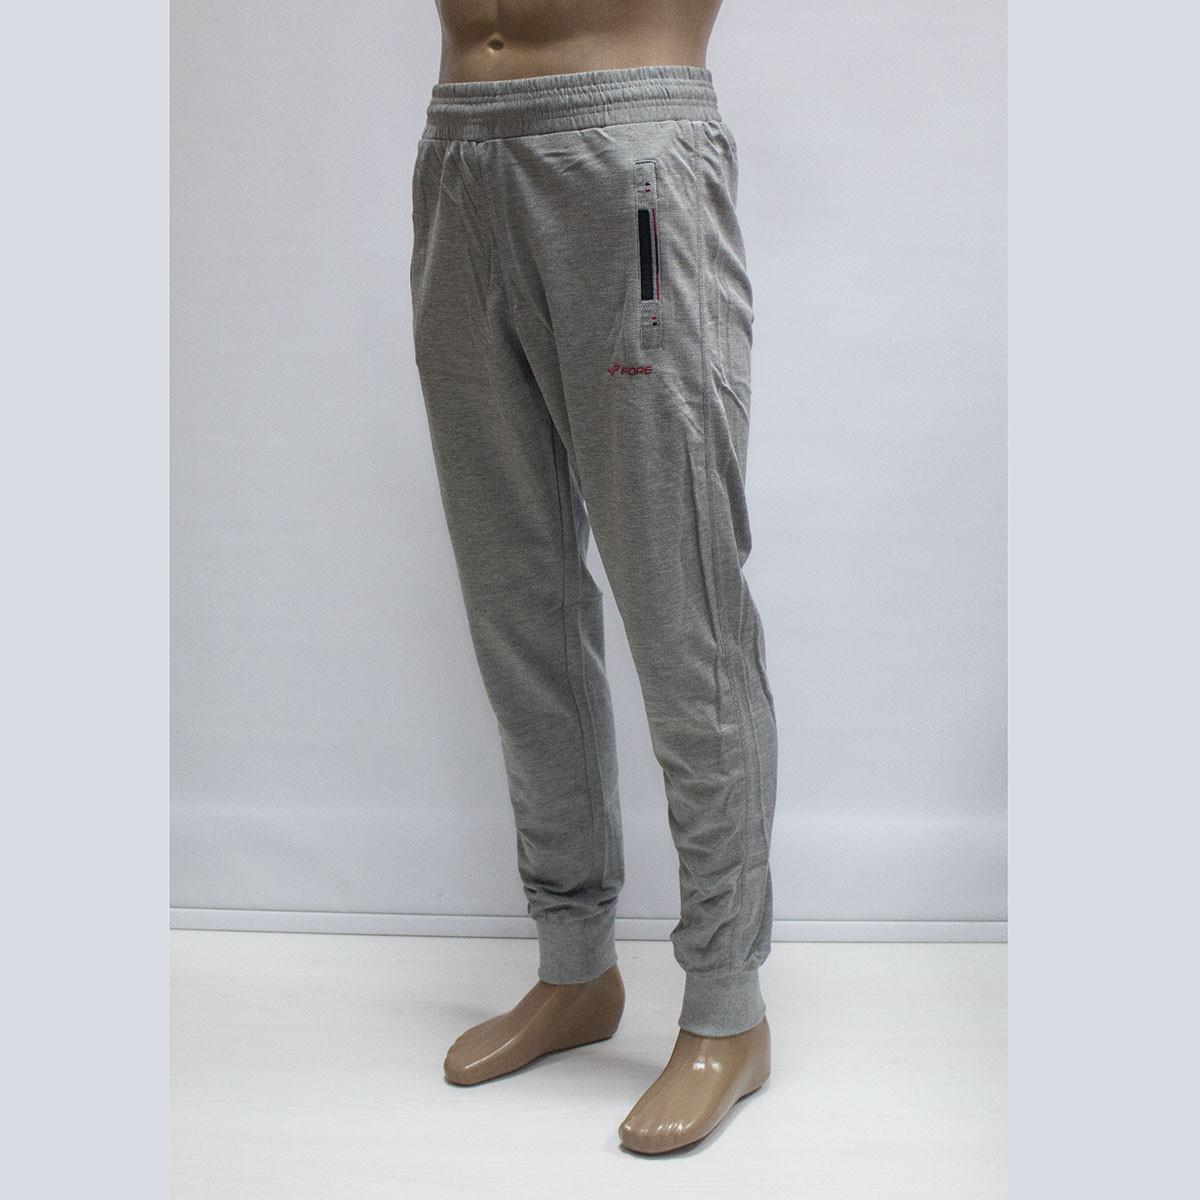 Мужские спортивные штаны под манжет Лакоста Турция тм. FORE 9505N